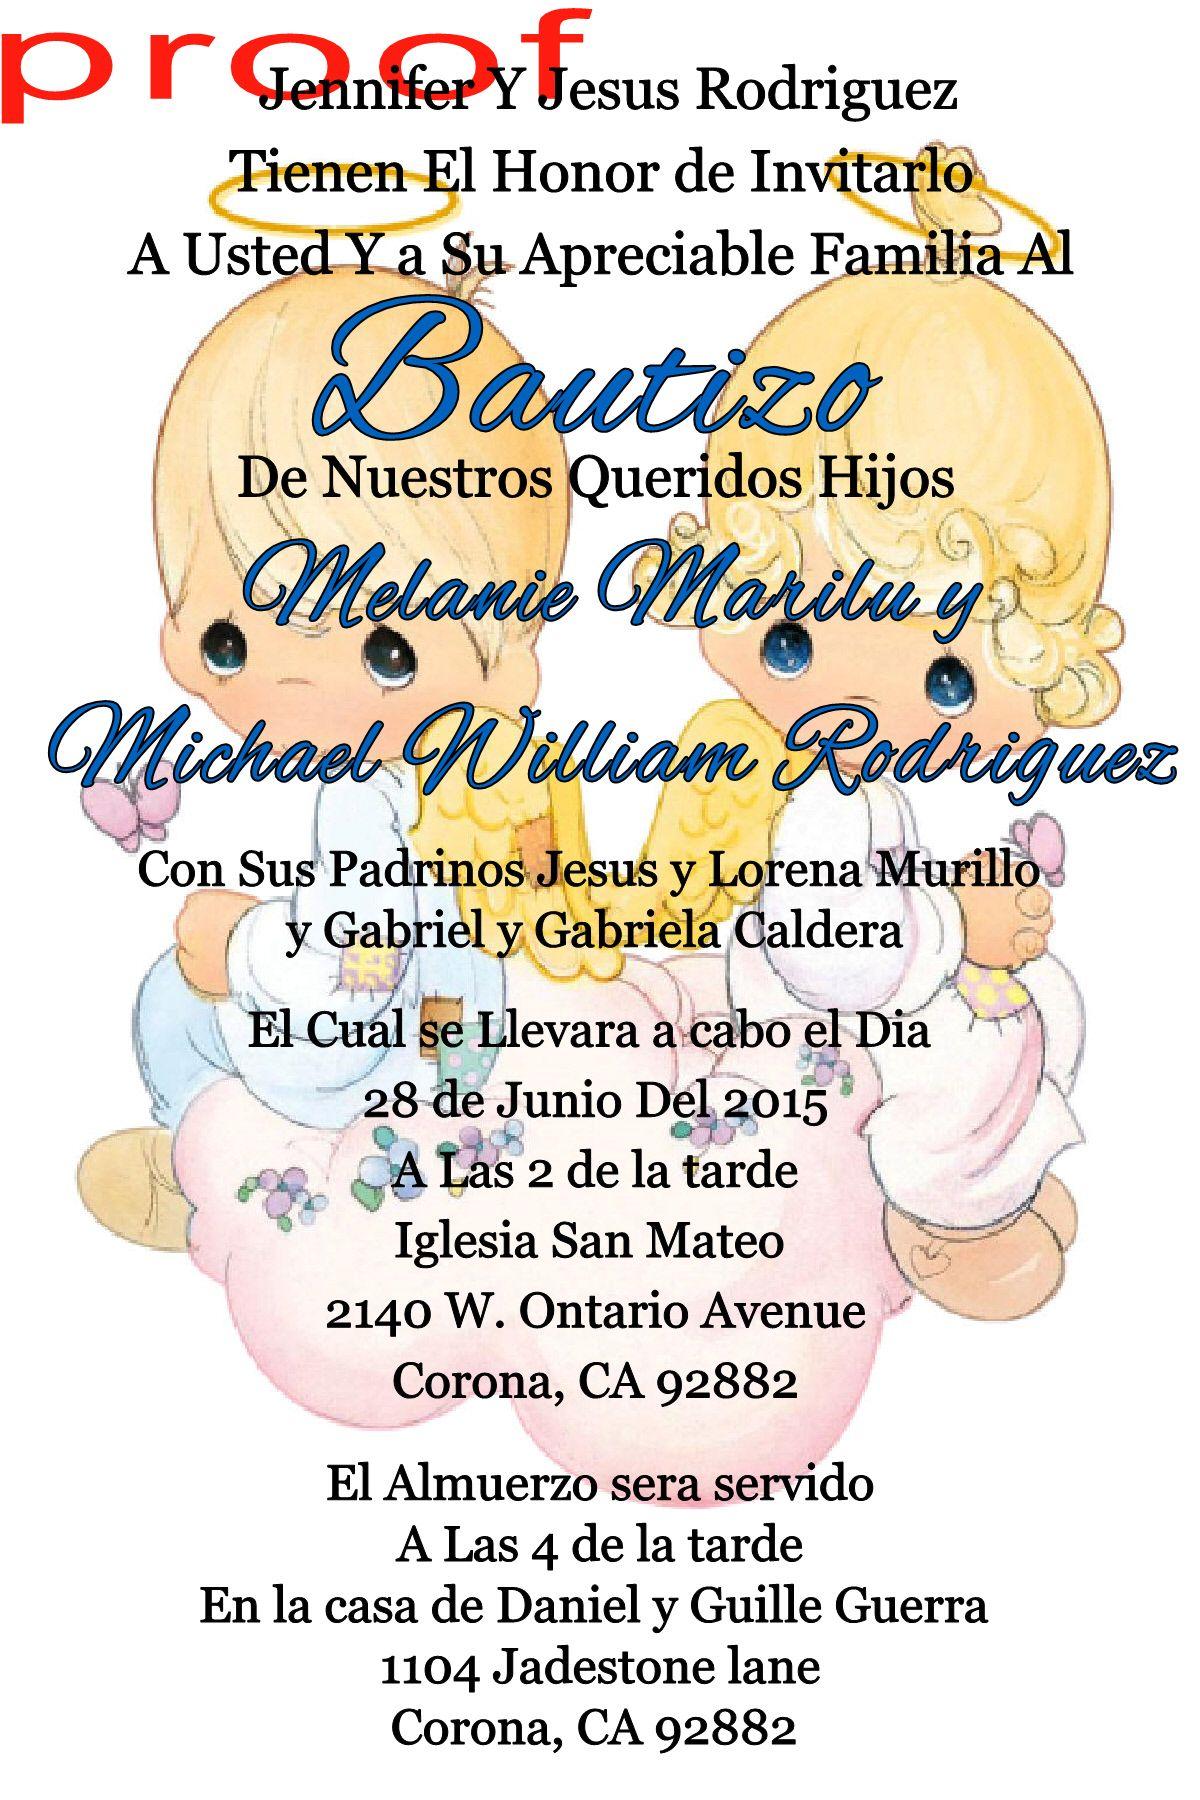 Precious Moments Spanish Baptism & Birthday Invitation - To place ...